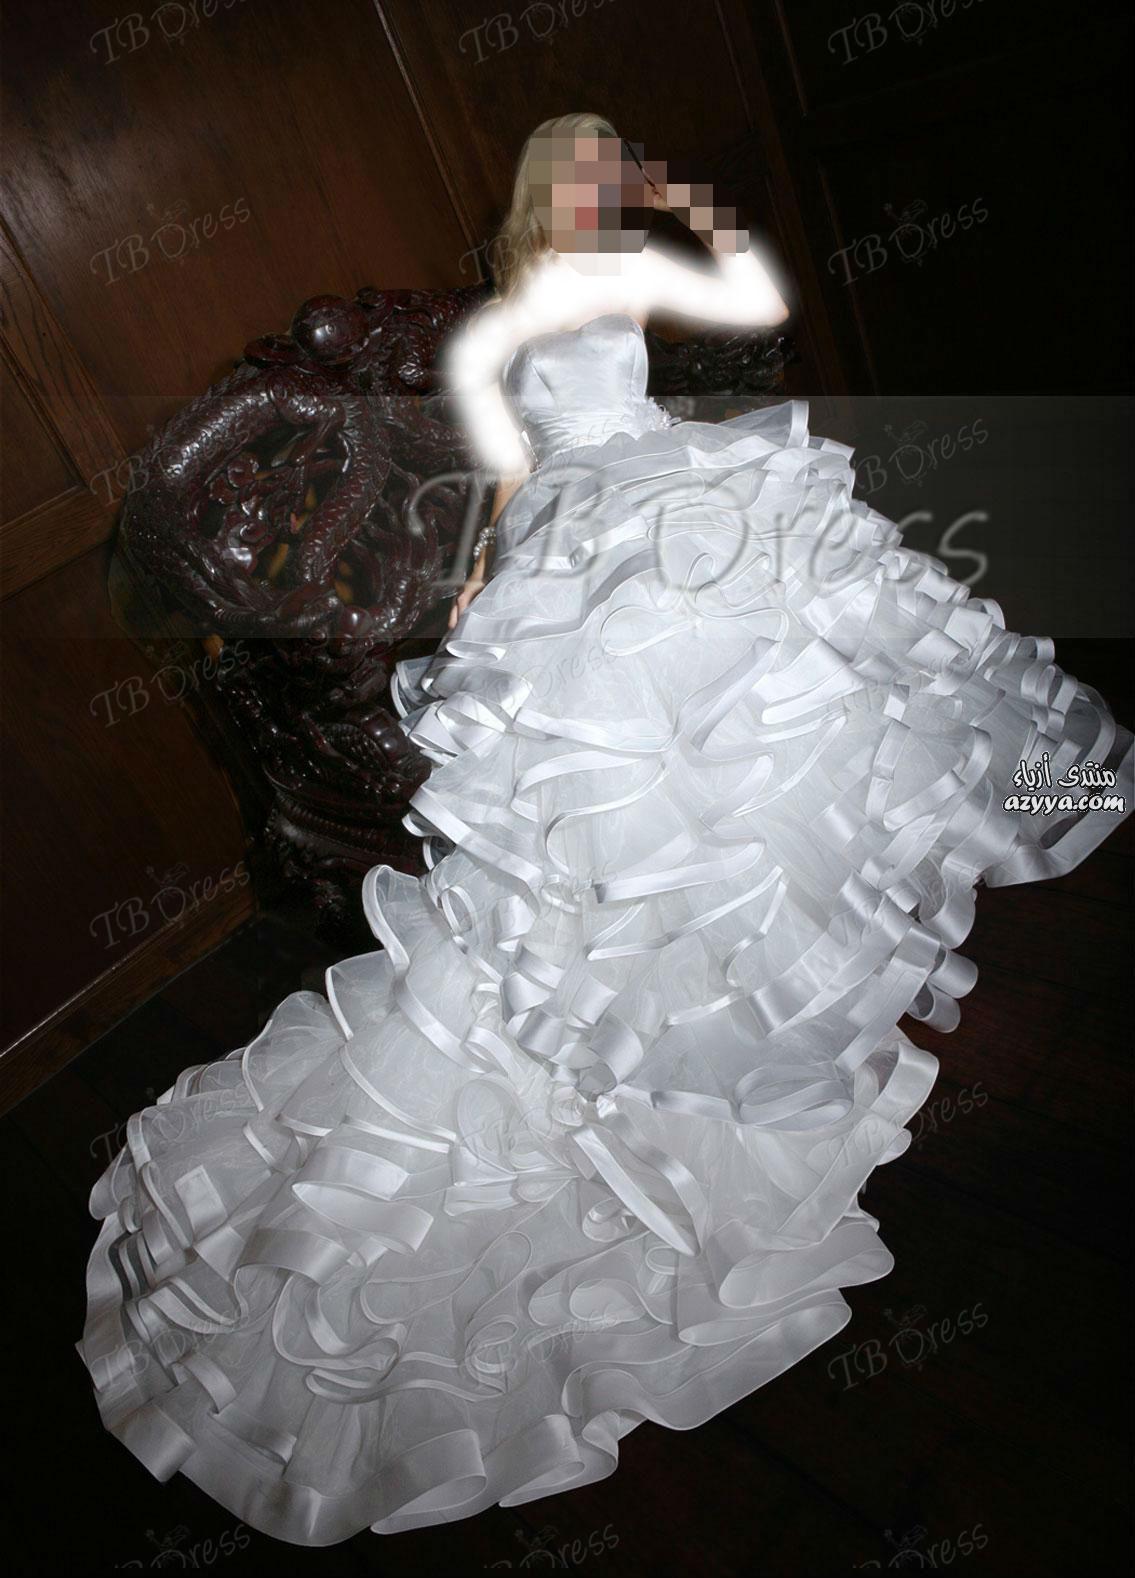 مواضيع ذات صلةفساتين زفاف الخريف لـ Monique Lhuilier للعروس